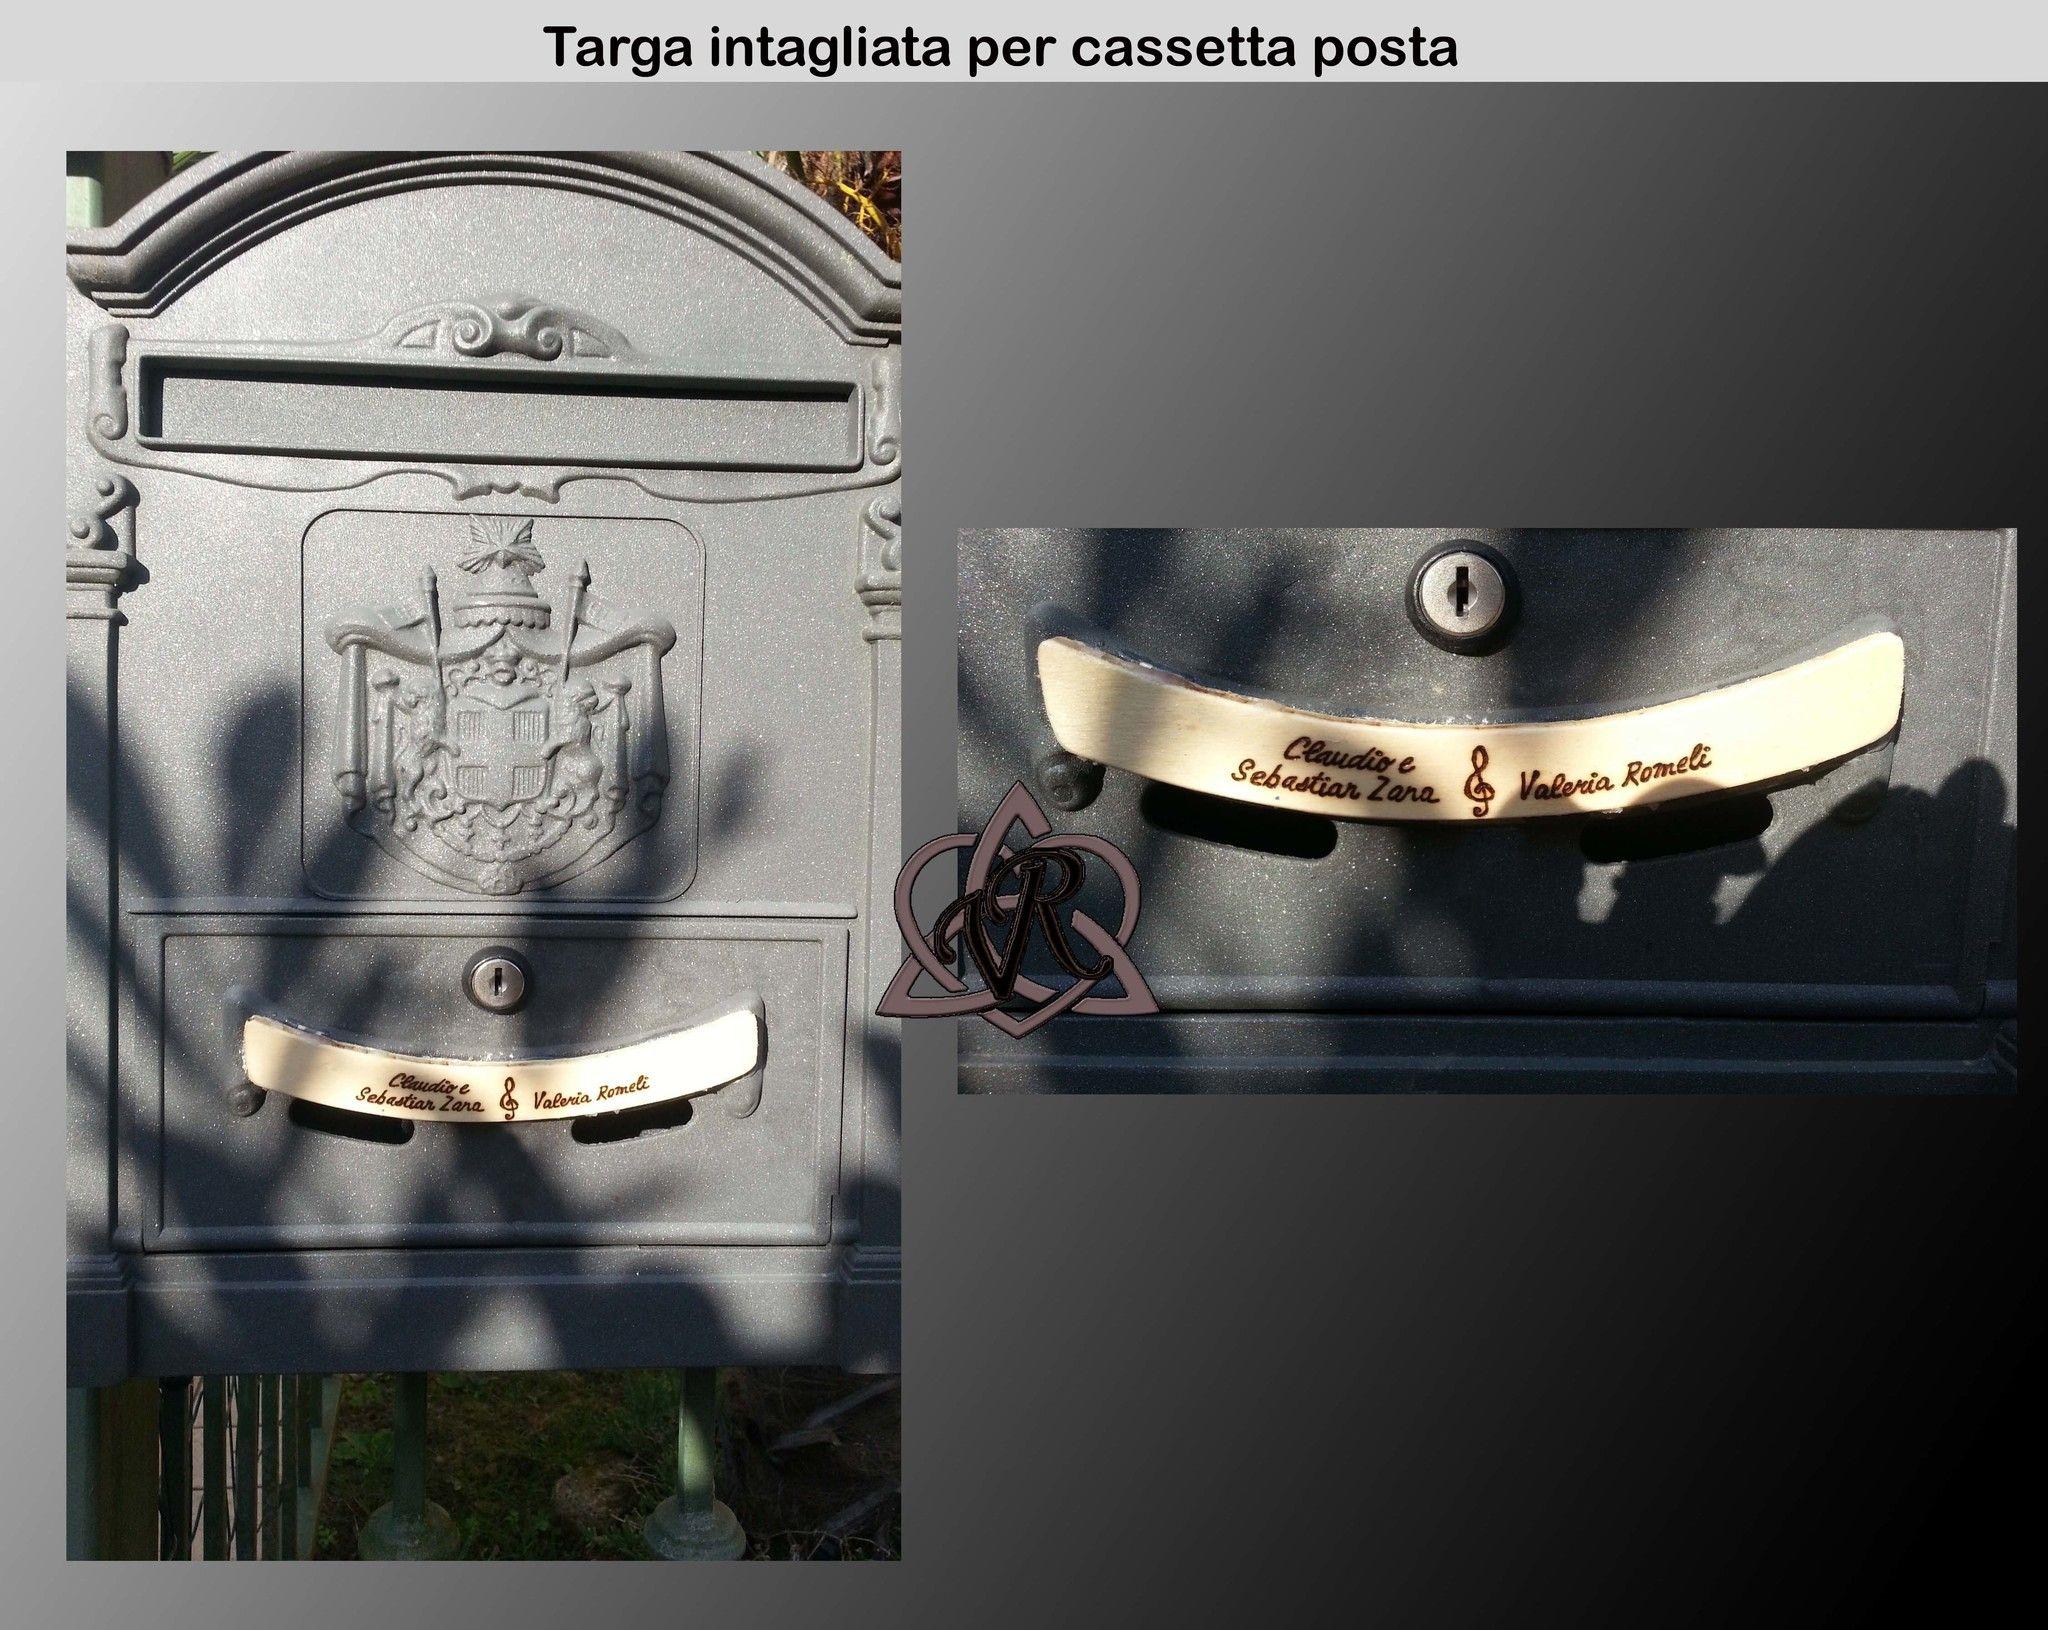 Targhetta intagliata per cassetta posta incisioni for Oggettistica cucina online